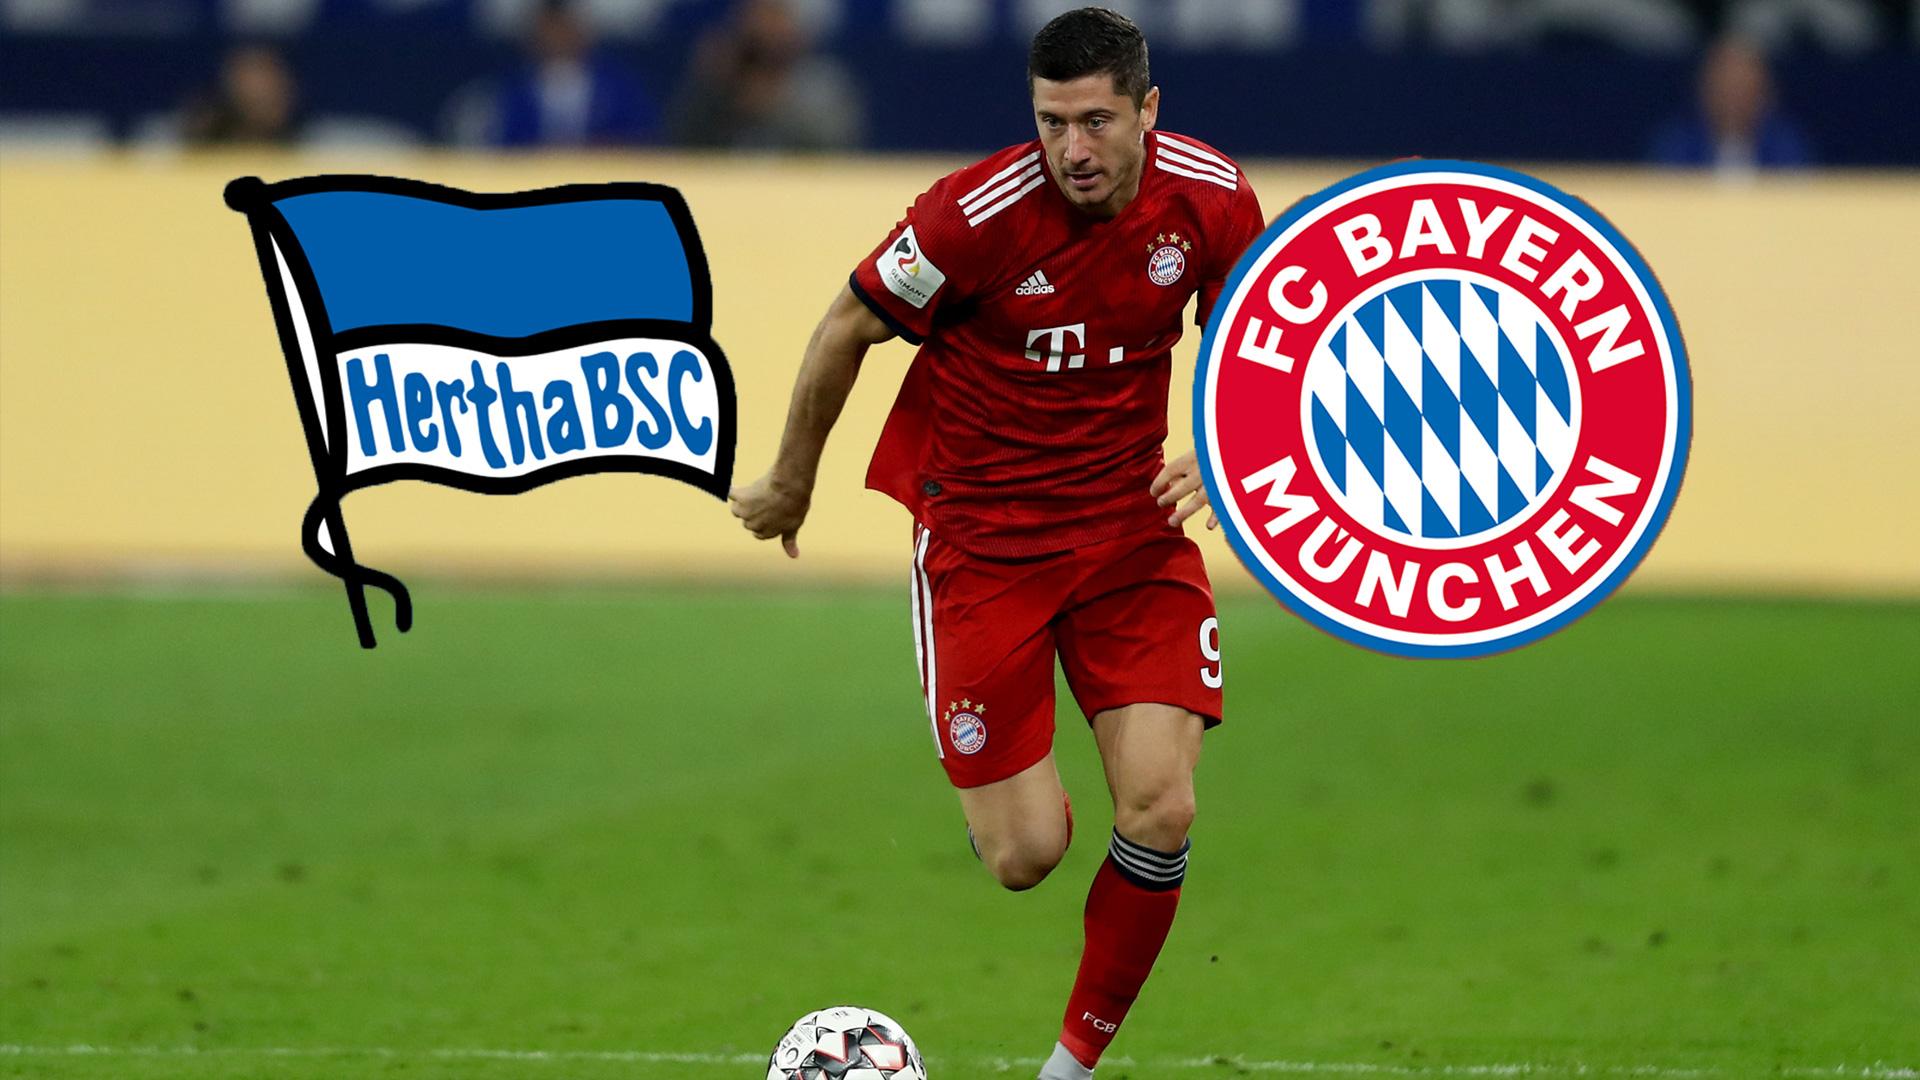 FC Bayern München Hertha BSC TV LIVESTREAM Bundesliga